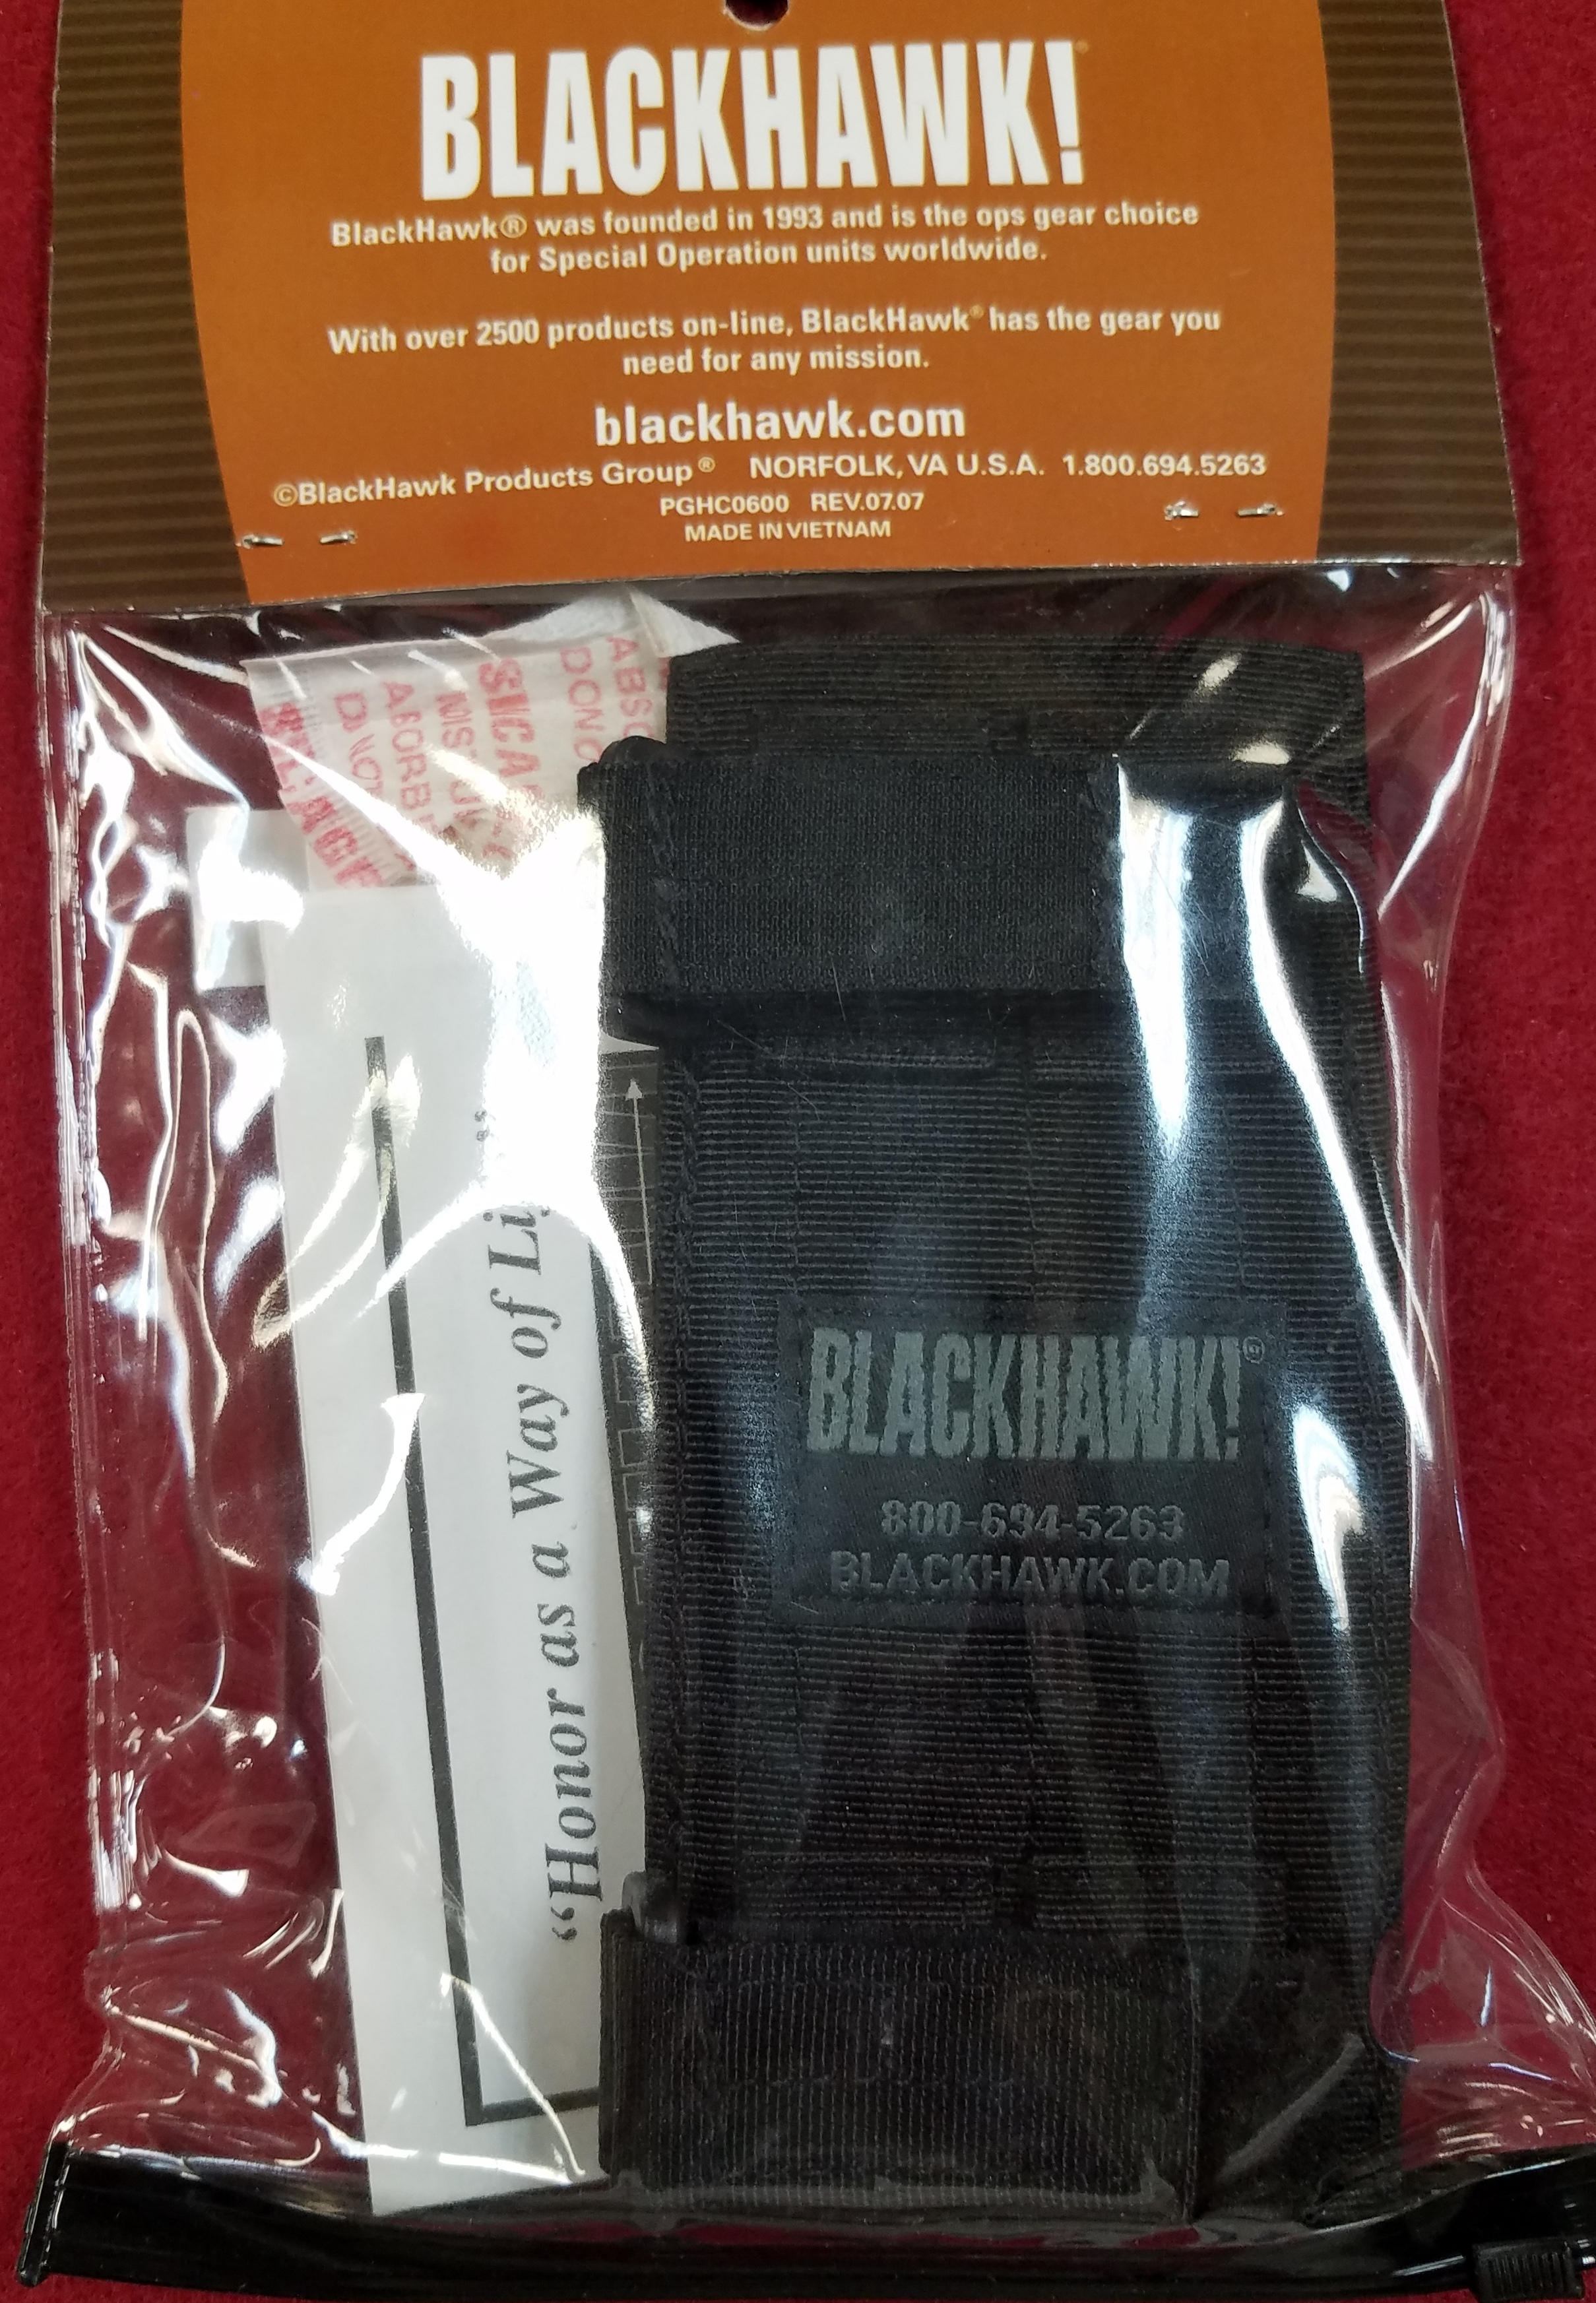 BLACKHAWK - 52BS17BK - BUTTSTOCK MAG POUCH M4 BLK